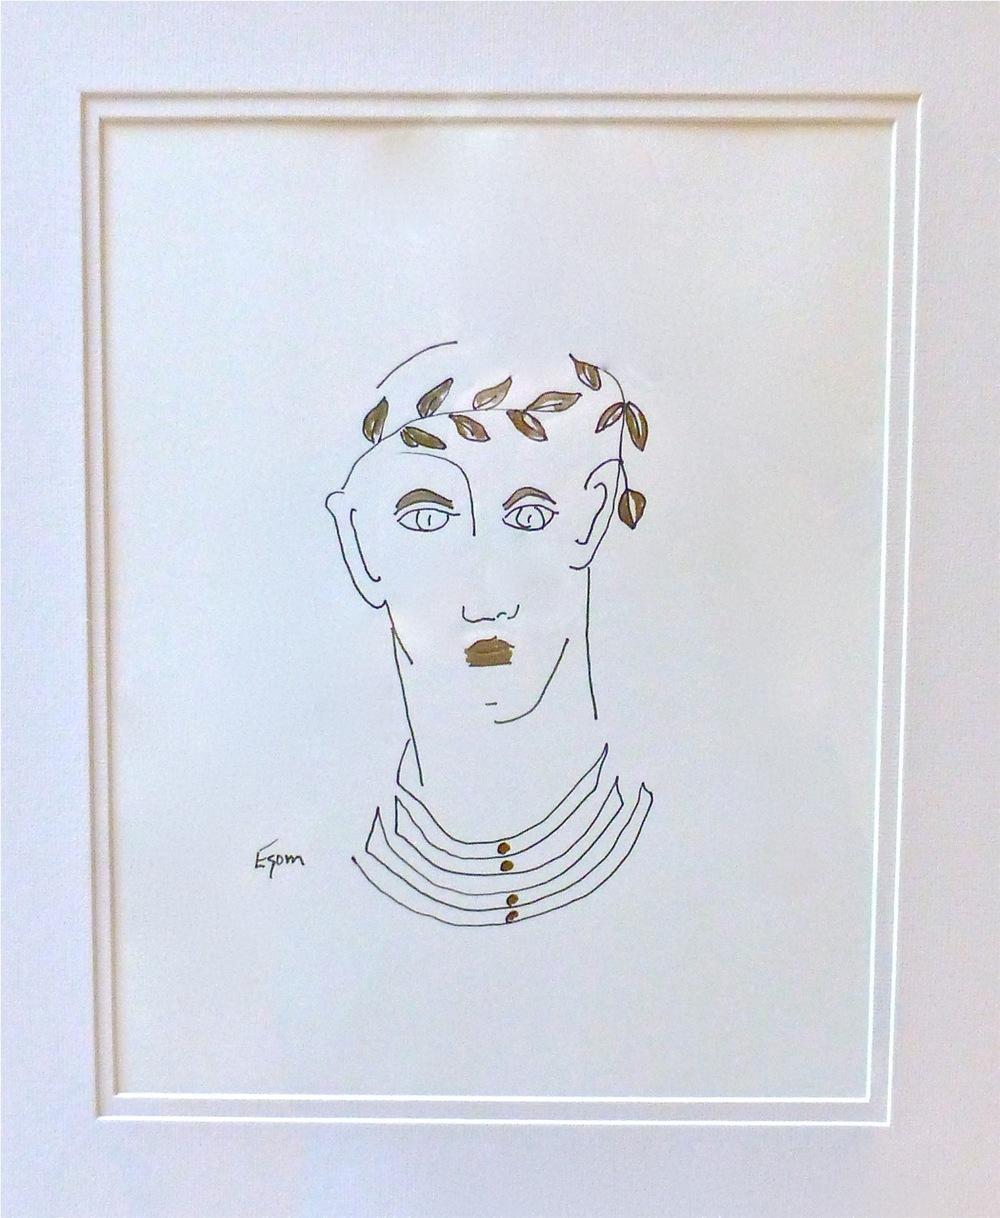 Drawing by Tony Mose_Cirque de Shreve_Friends of the Algur Meadows Museum Benefit.jpg